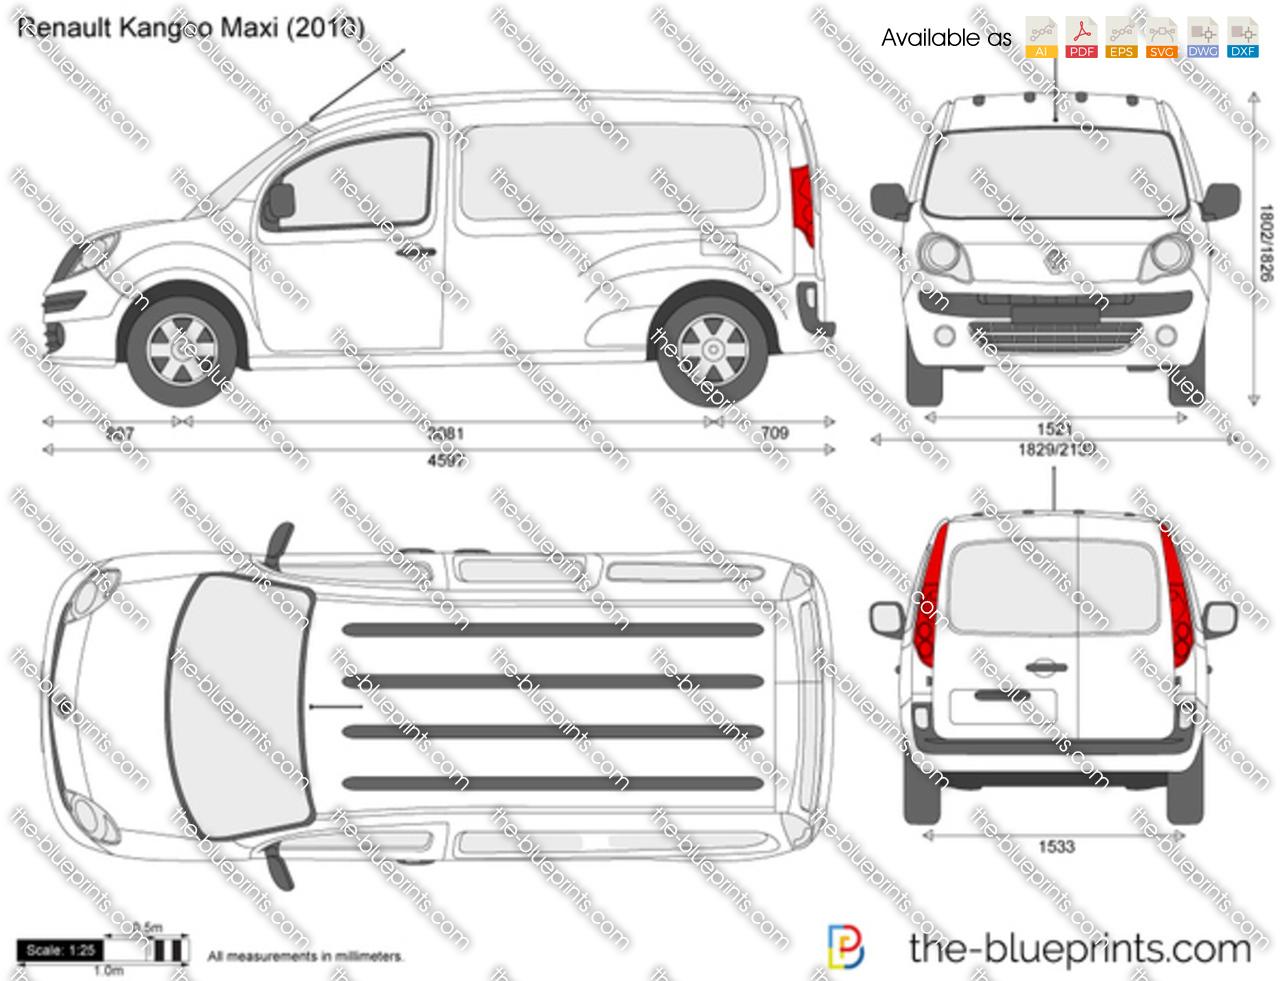 Renault Kangoo Maxi 2009